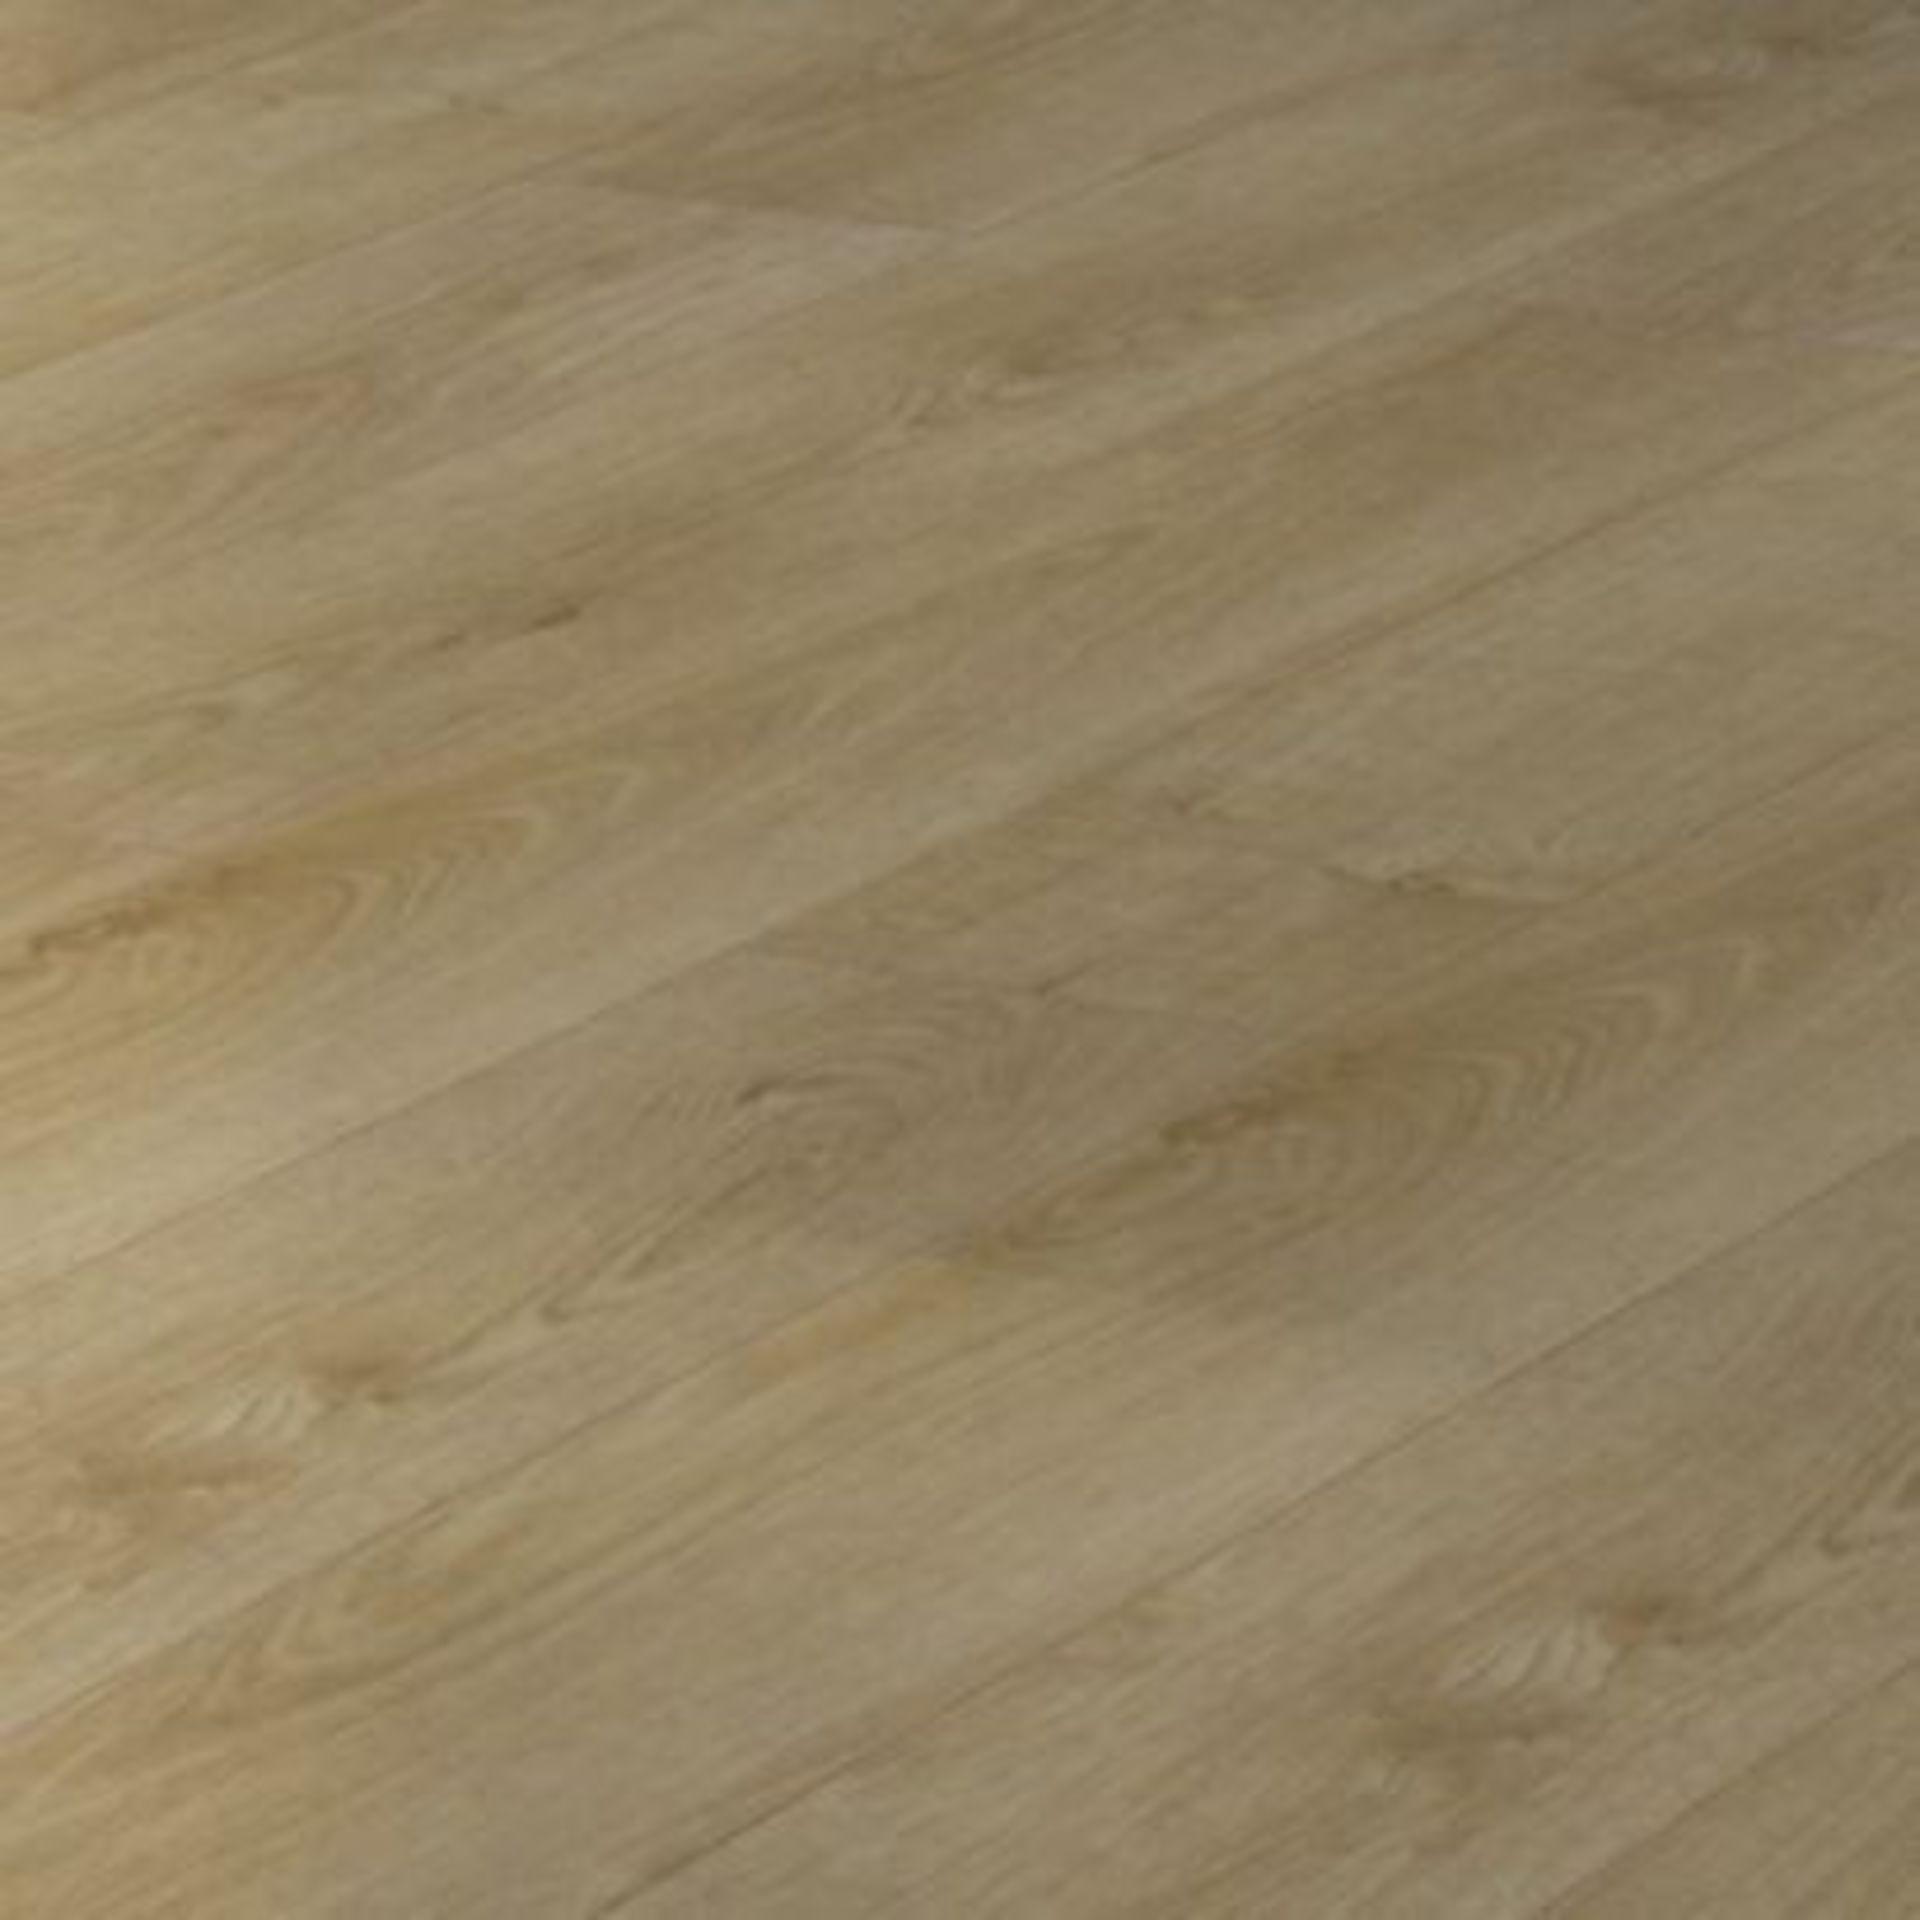 NEW 20M2 Milano oak effect Laminate flooring, 1.25m² Pack. This Overture laminate flooring offers - Image 3 of 3